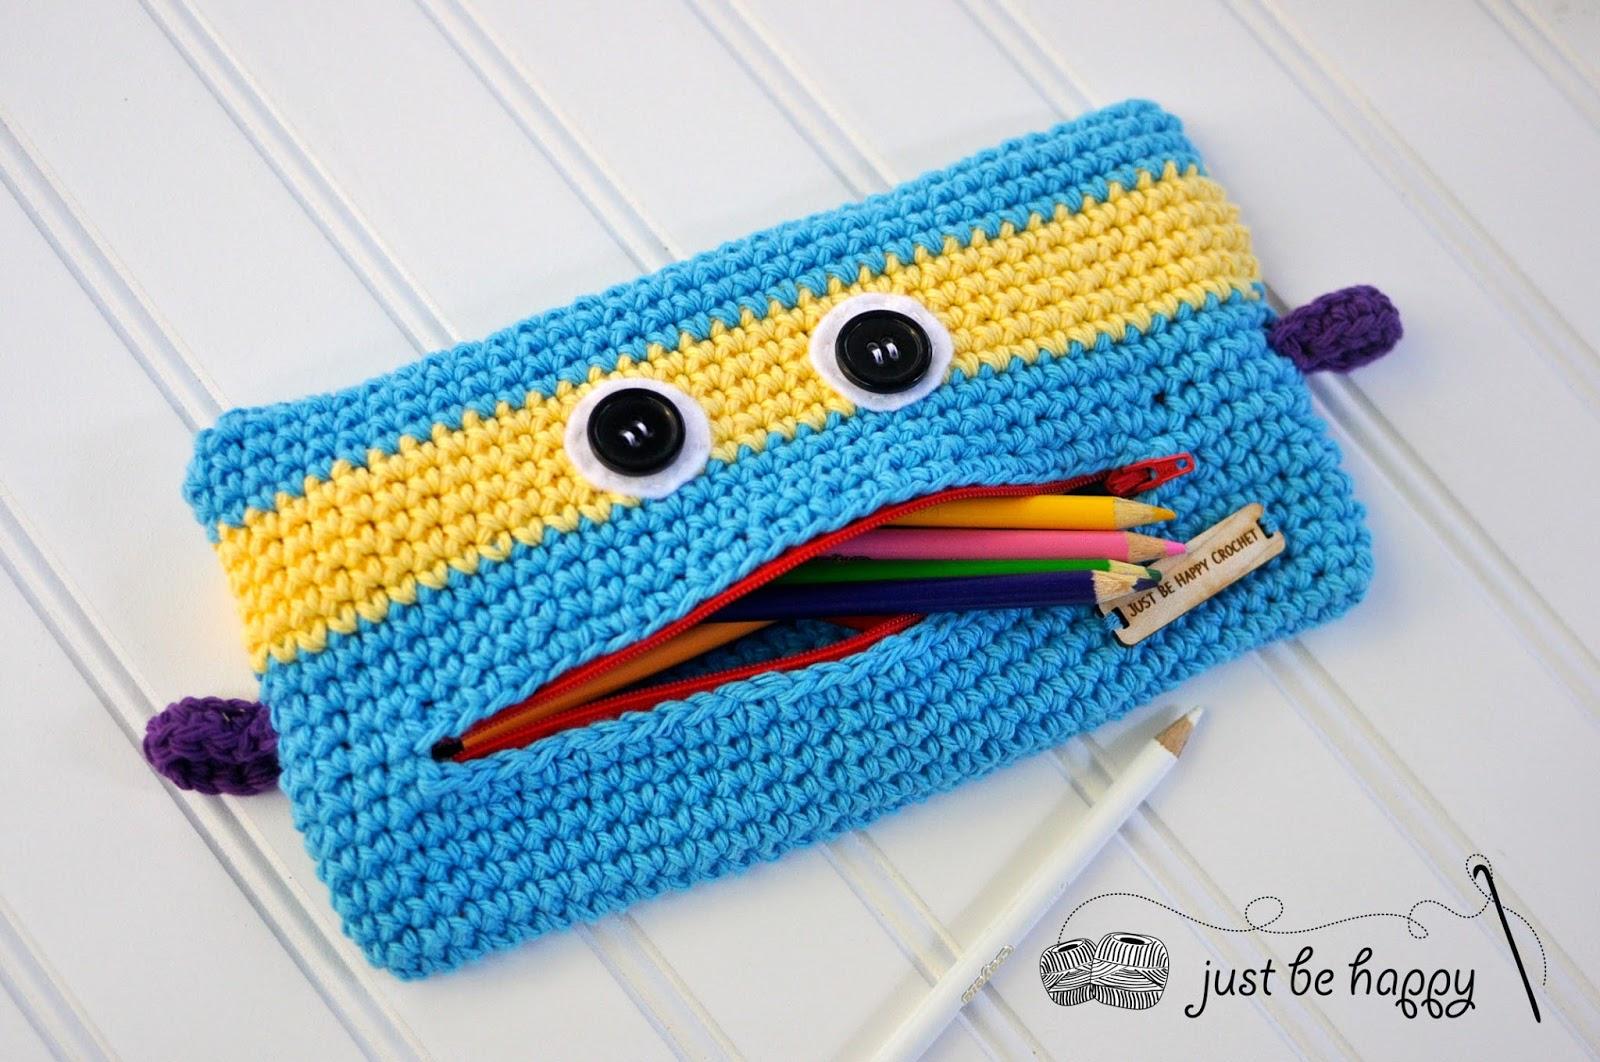 Just be happy!: Monster Pencil Case - Crochet Pattern